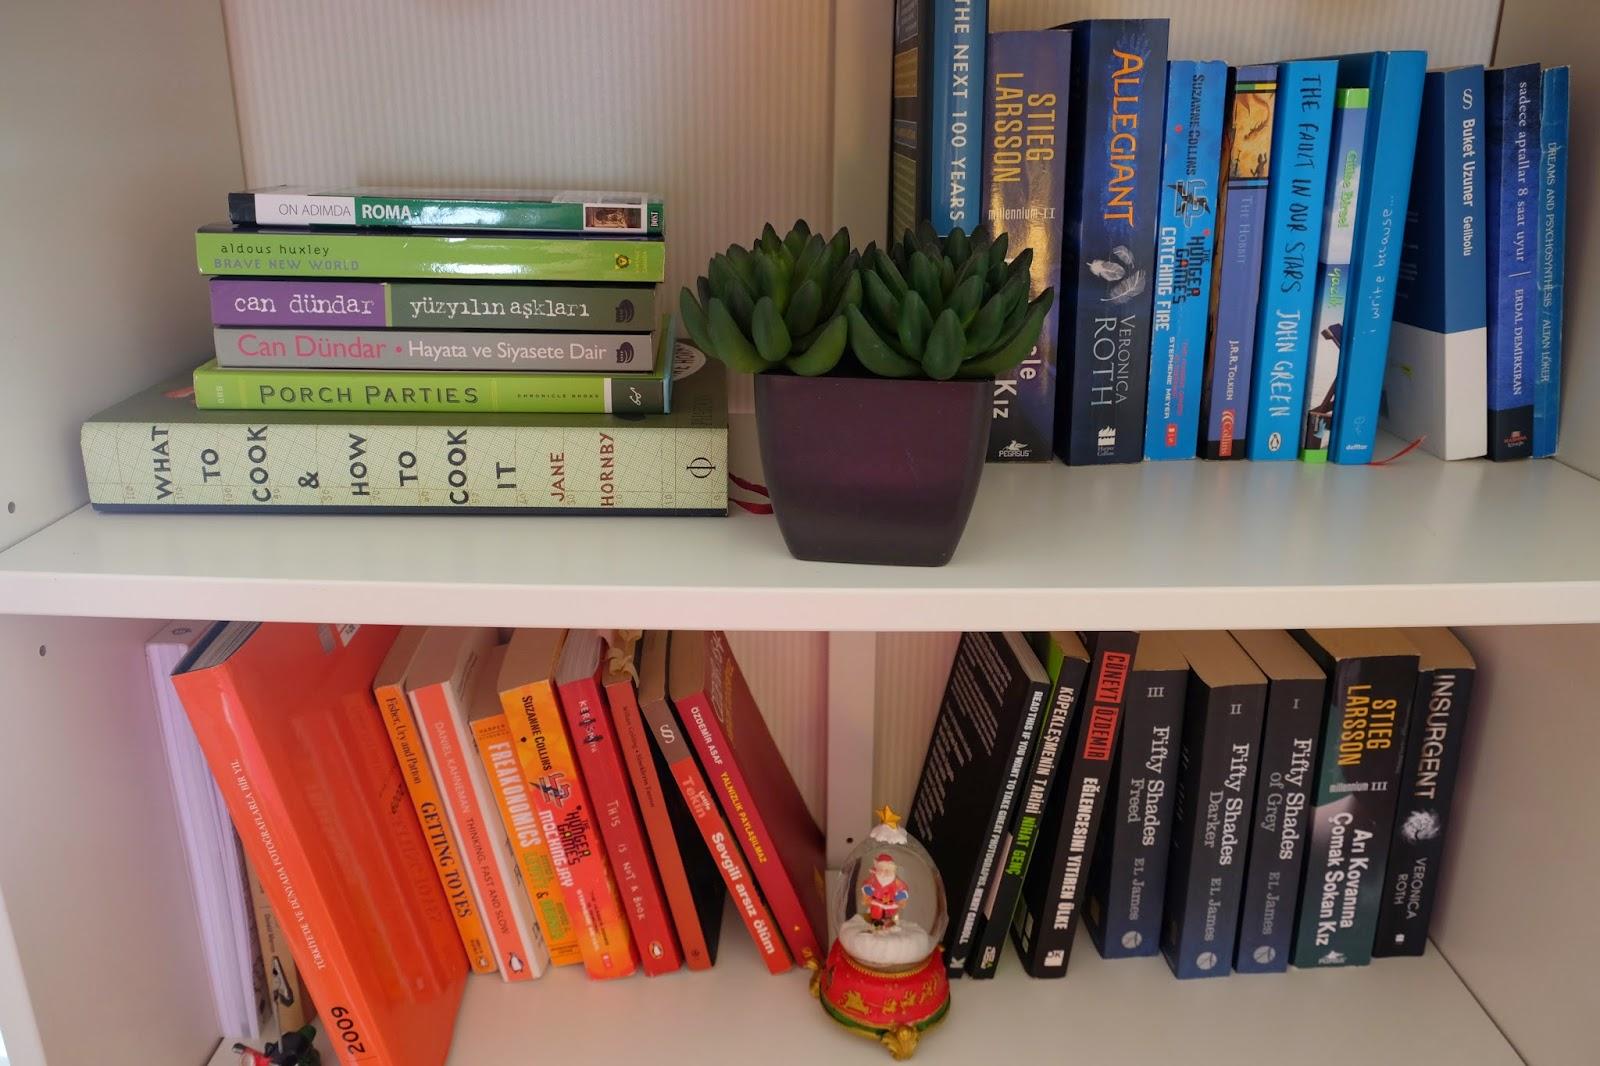 color-coding-books kitaplari-renklere-gore-ayirmak